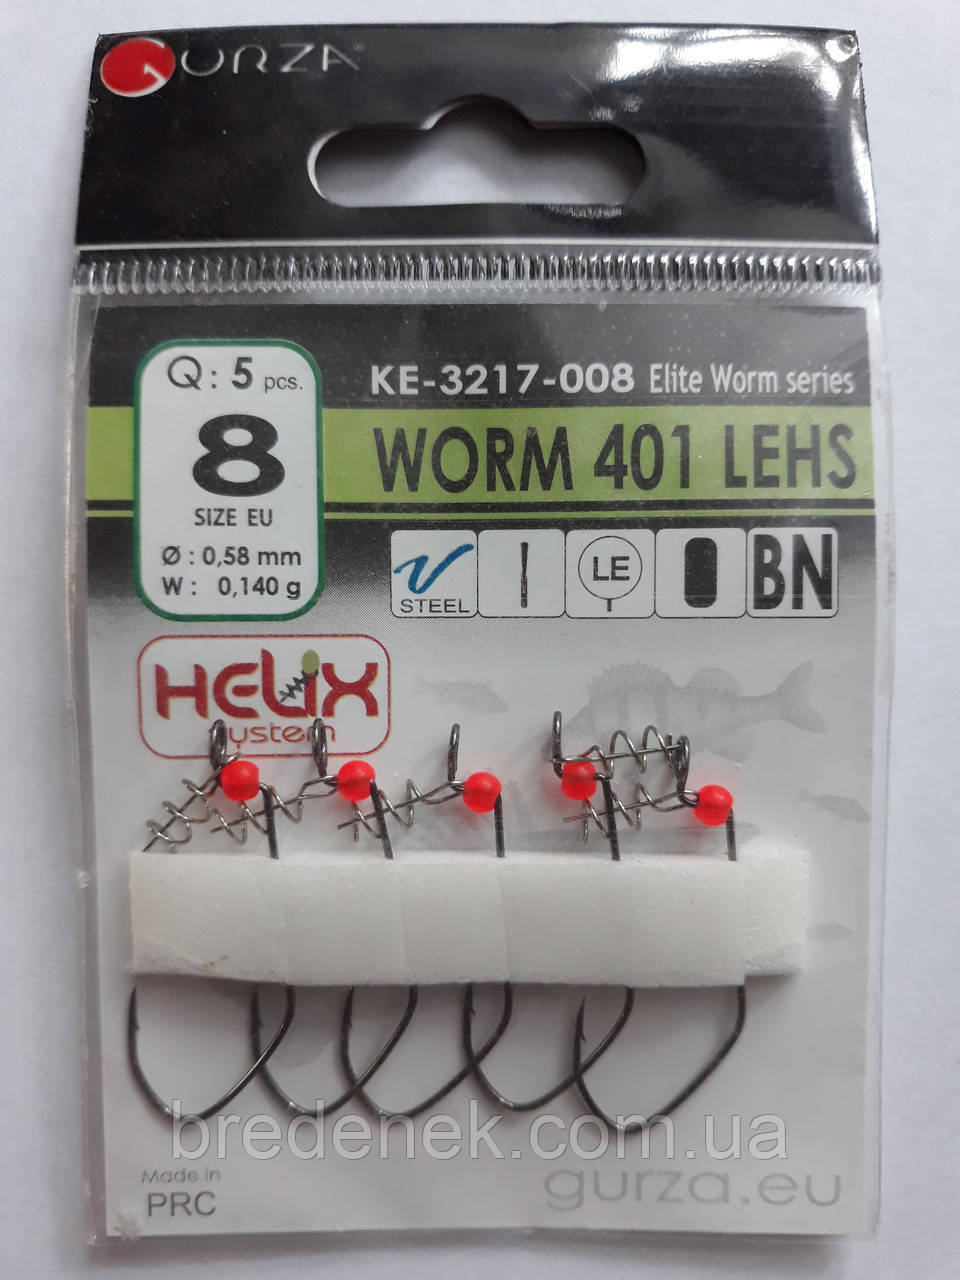 Крючки Gurza worm 401 lehs № 8